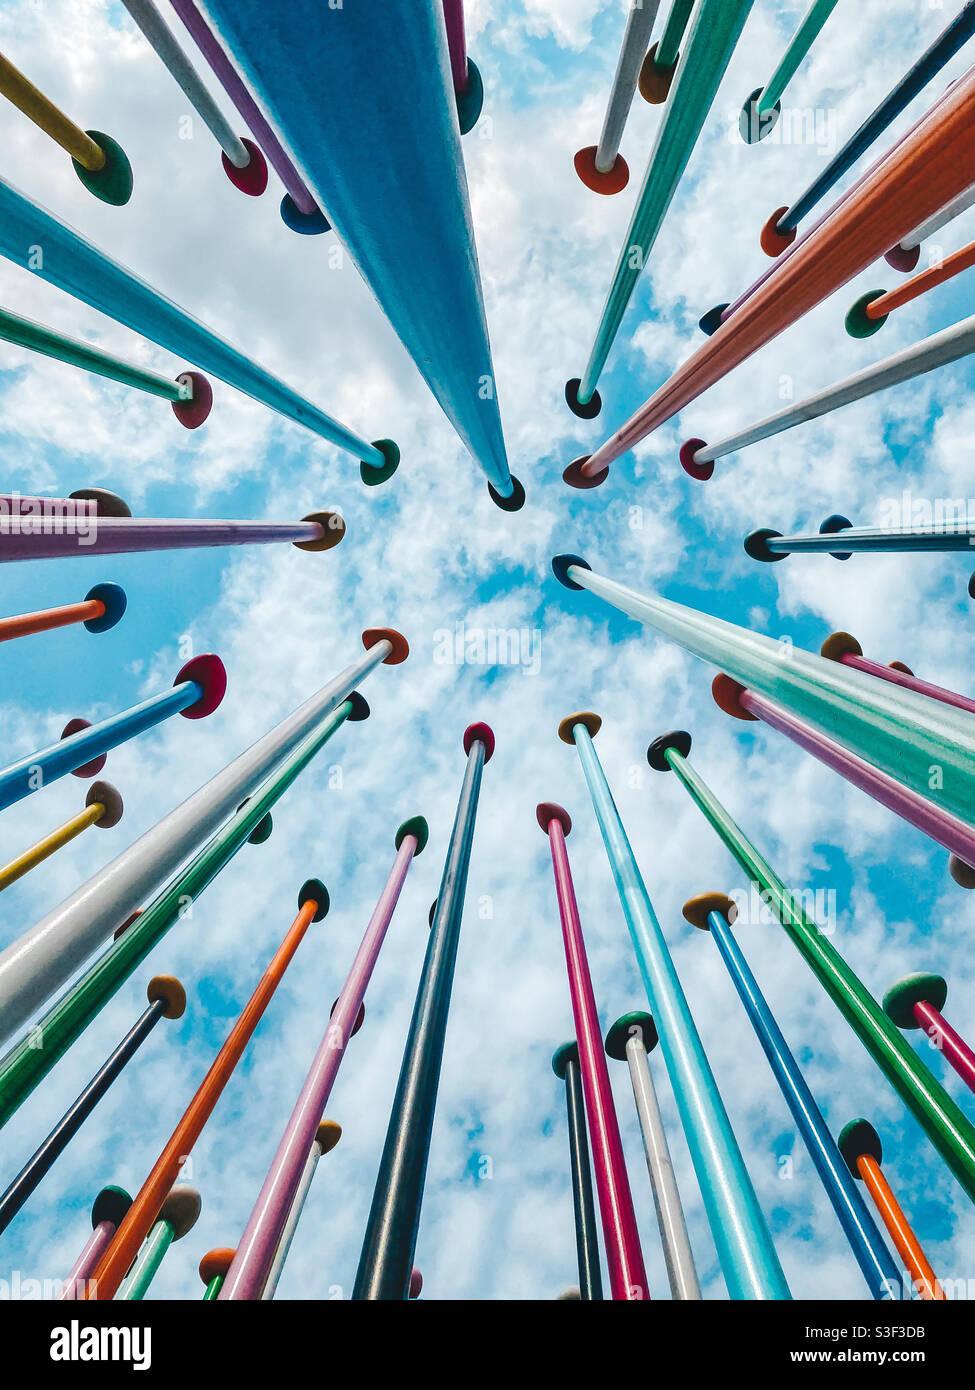 Coloris Art Line Milano - Milano Colors Stockfoto